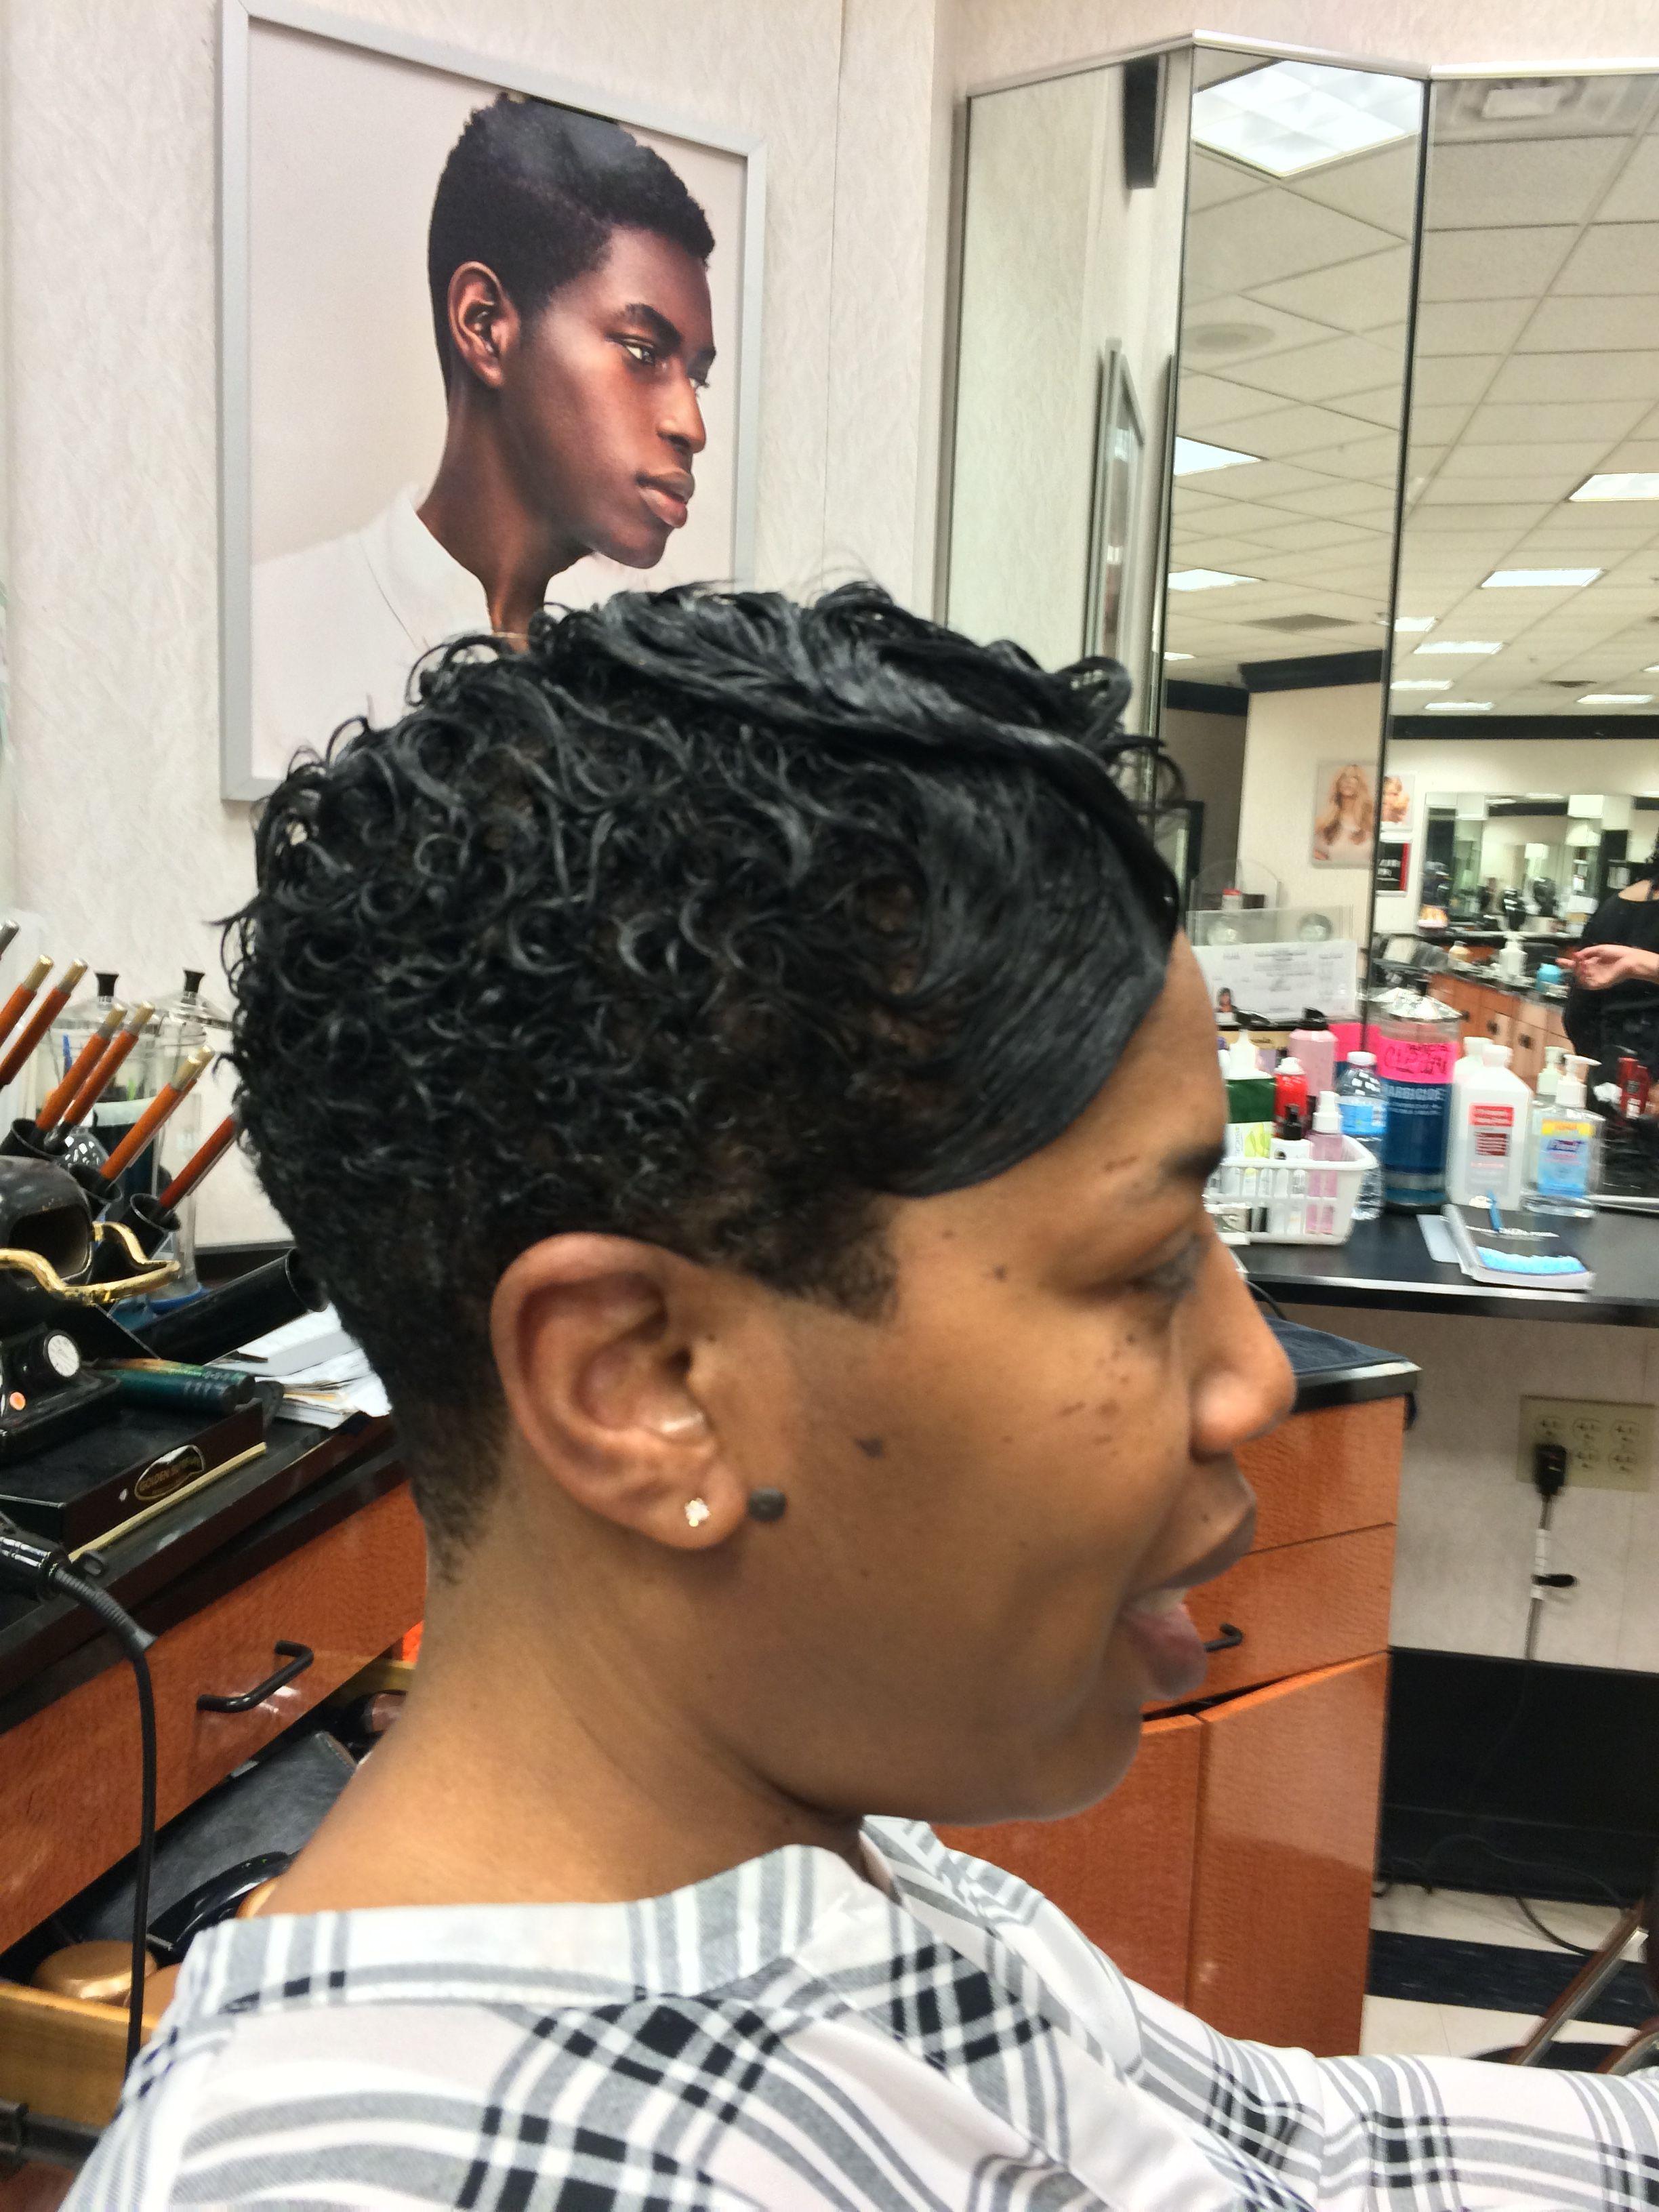 Pin By Felice Robinson On Hairstylist In Las Vegas Nevada Hair By Felice Jcpenny Salon Galleria Mall Henderson Nevada 702 451 4562 Short Styles Hair Stylist